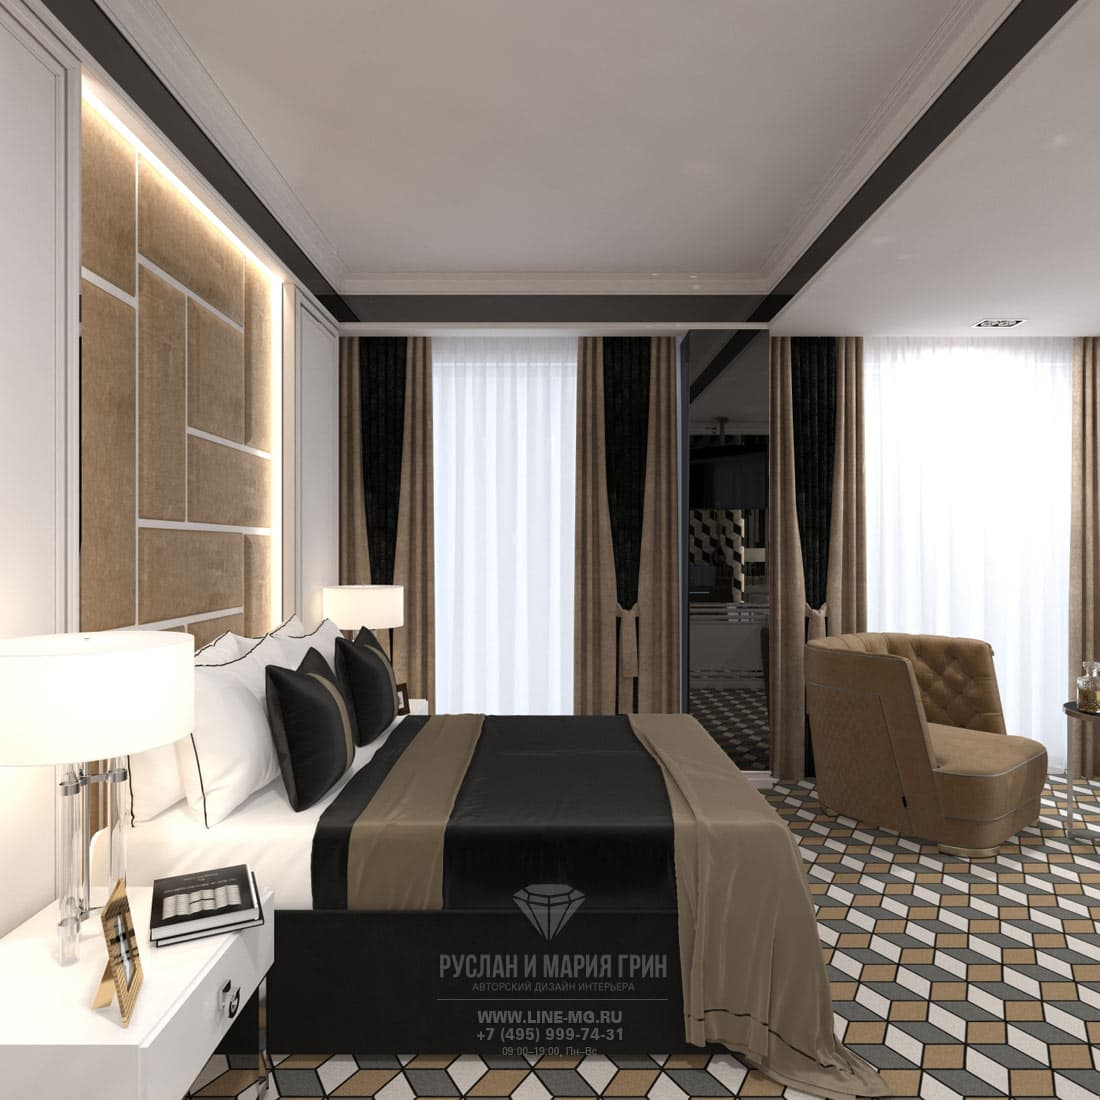 Дизайн номера люкс в бутик-отеле